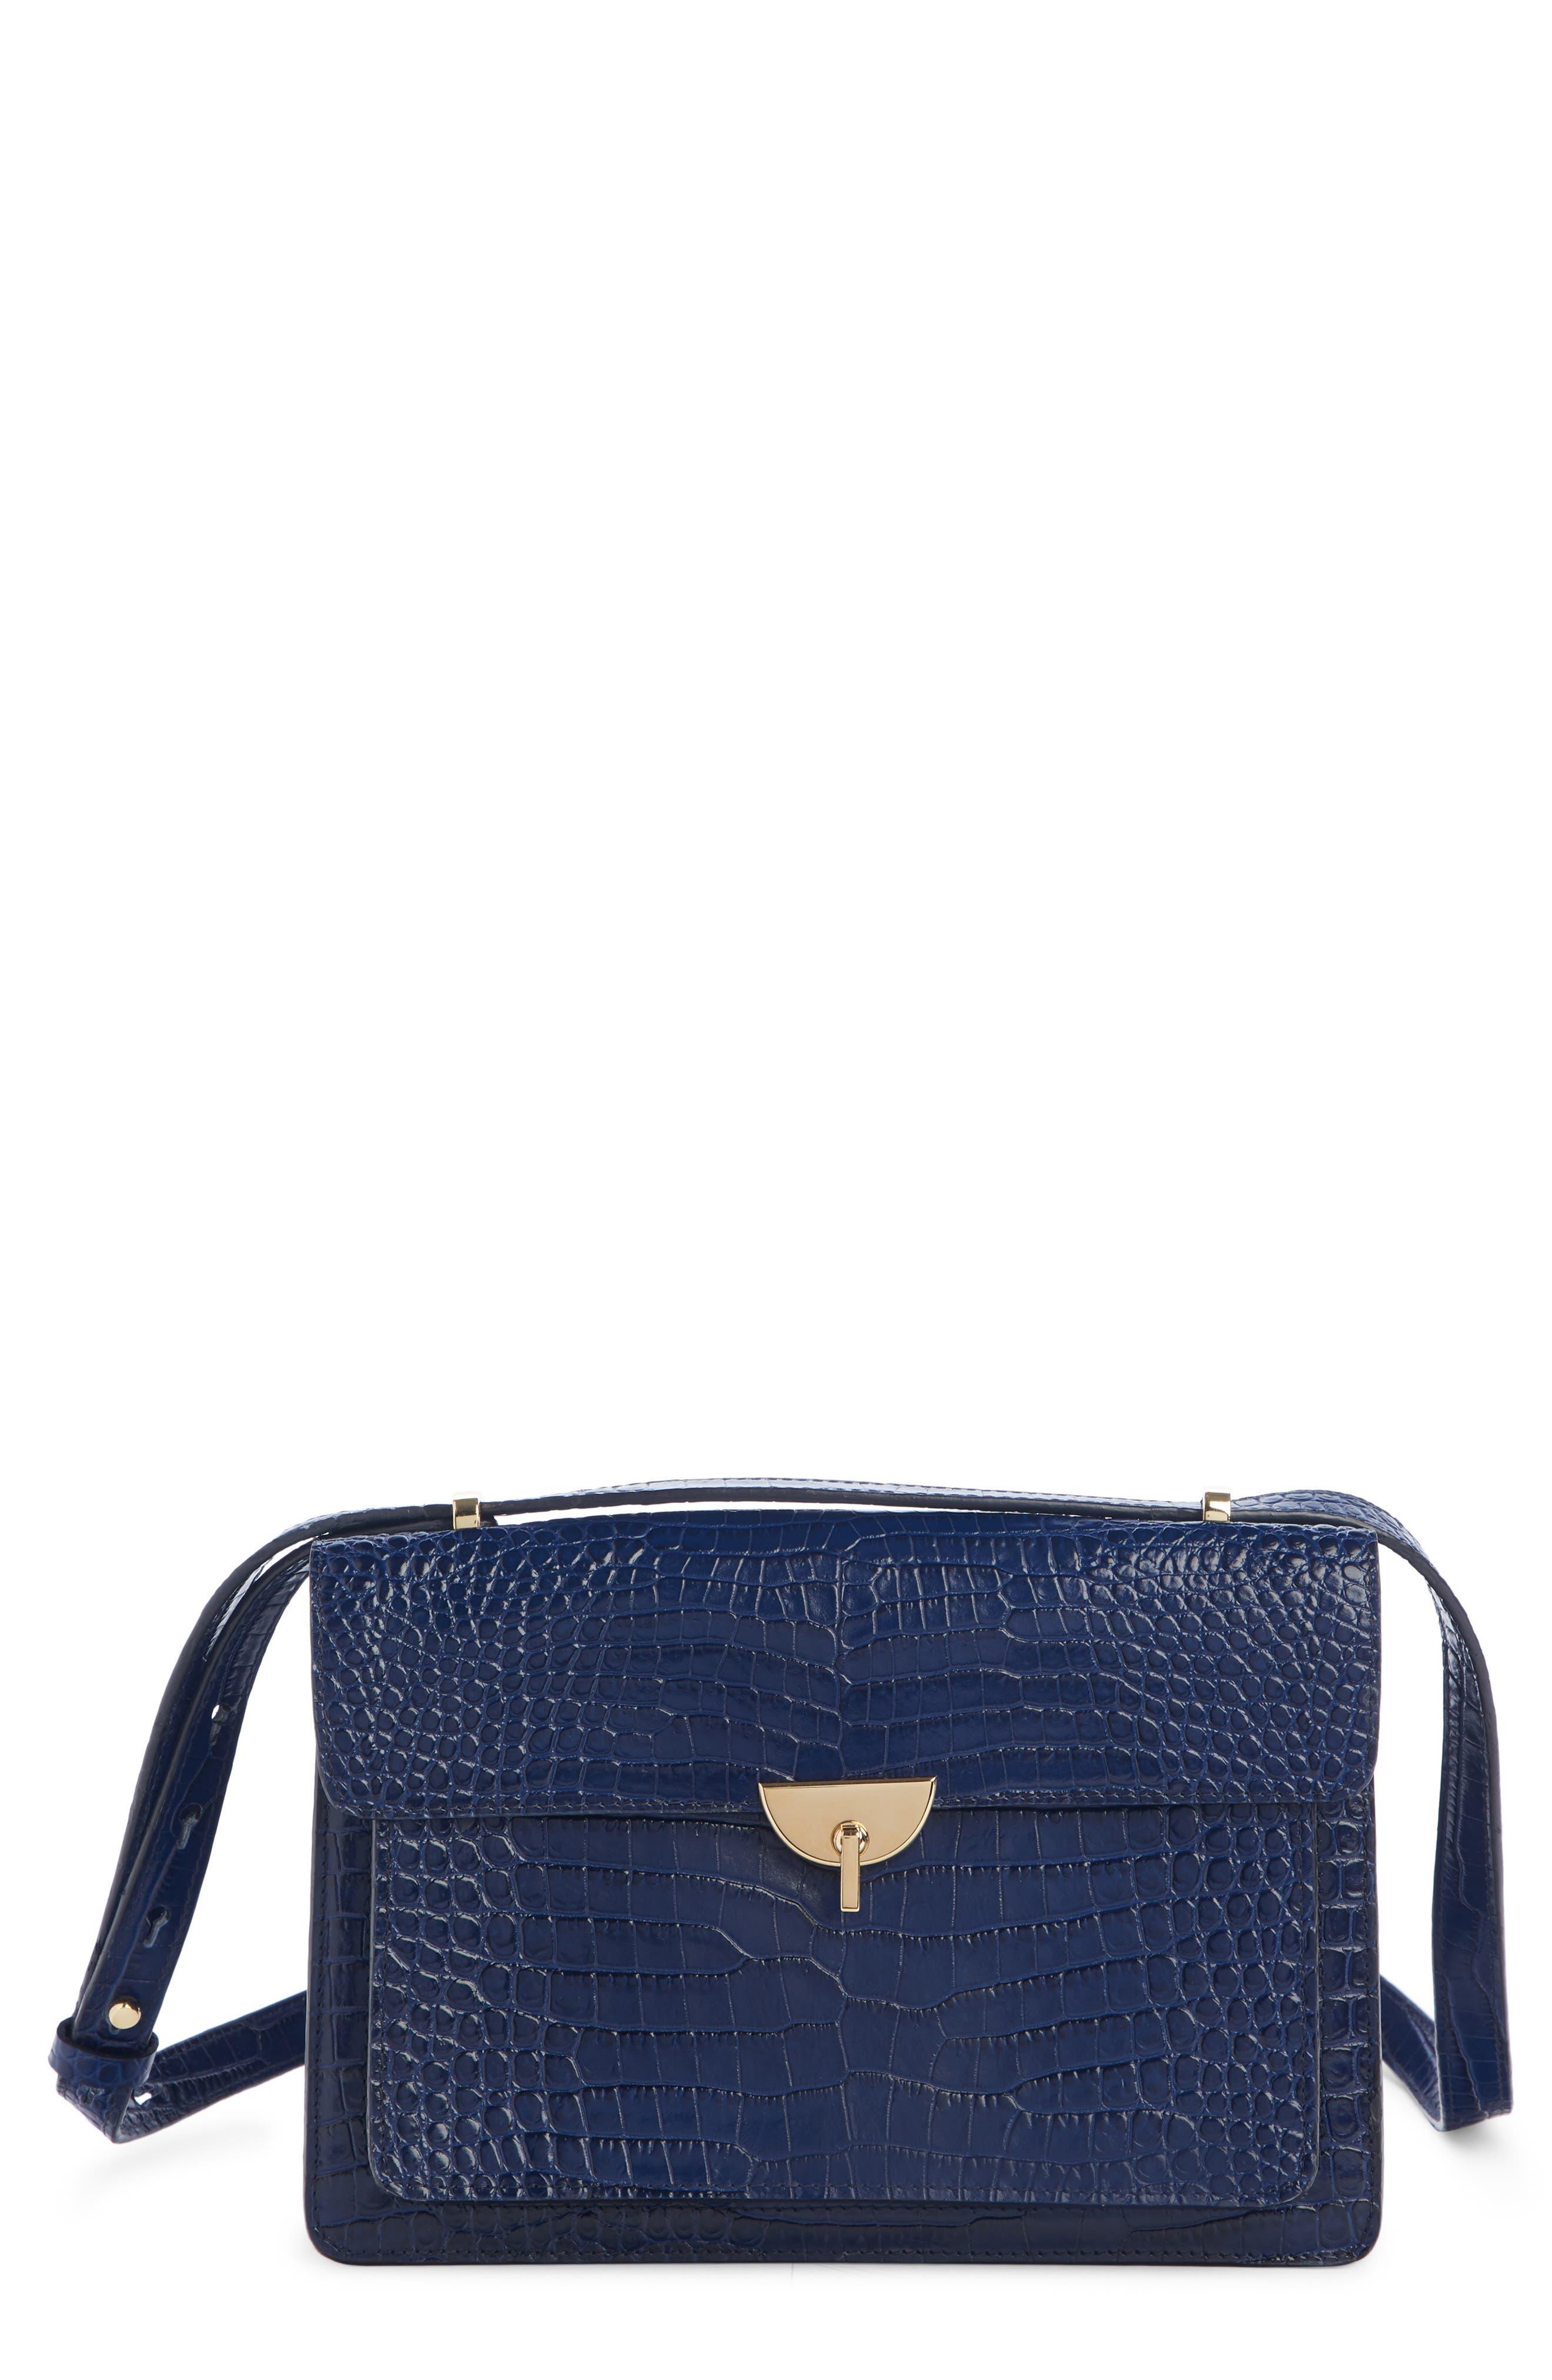 DRIES VAN NOTEN Croc Embossed Leather Crossbody Bag, Main, color, BLUE